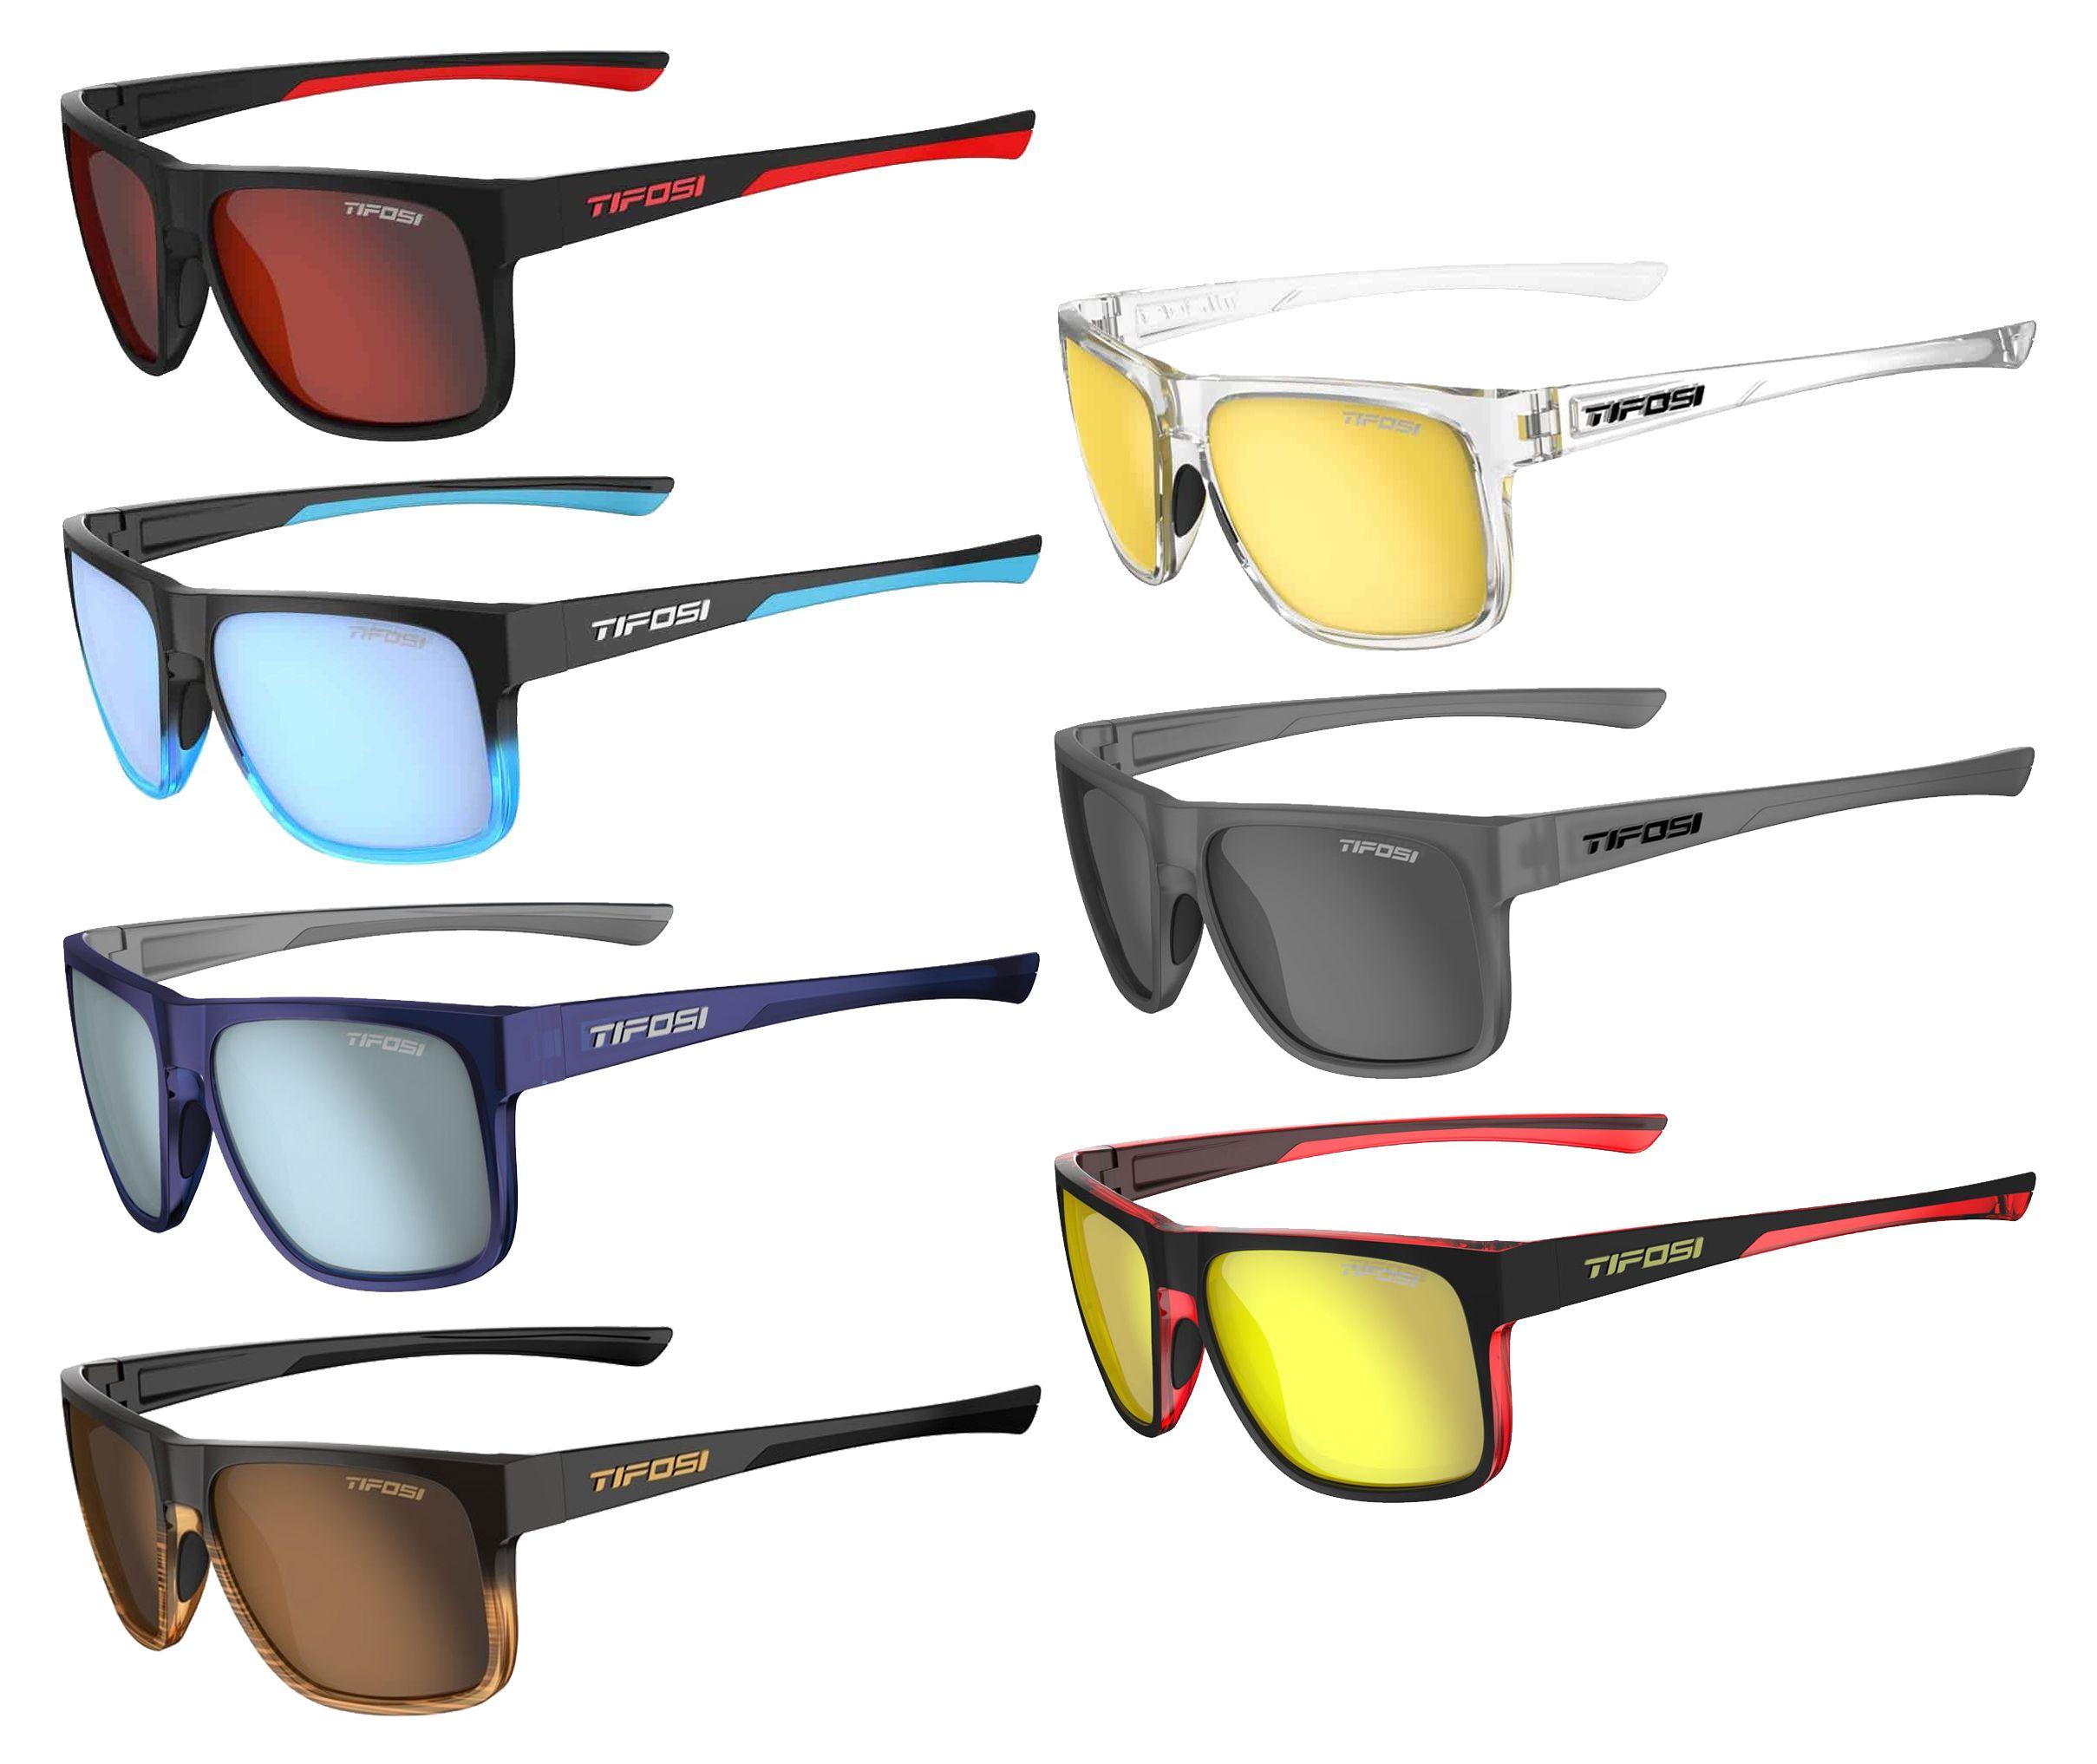 8bc30fe30c057 Tifosi Swick Single Polycarbonate Lens Glasses - £26.99